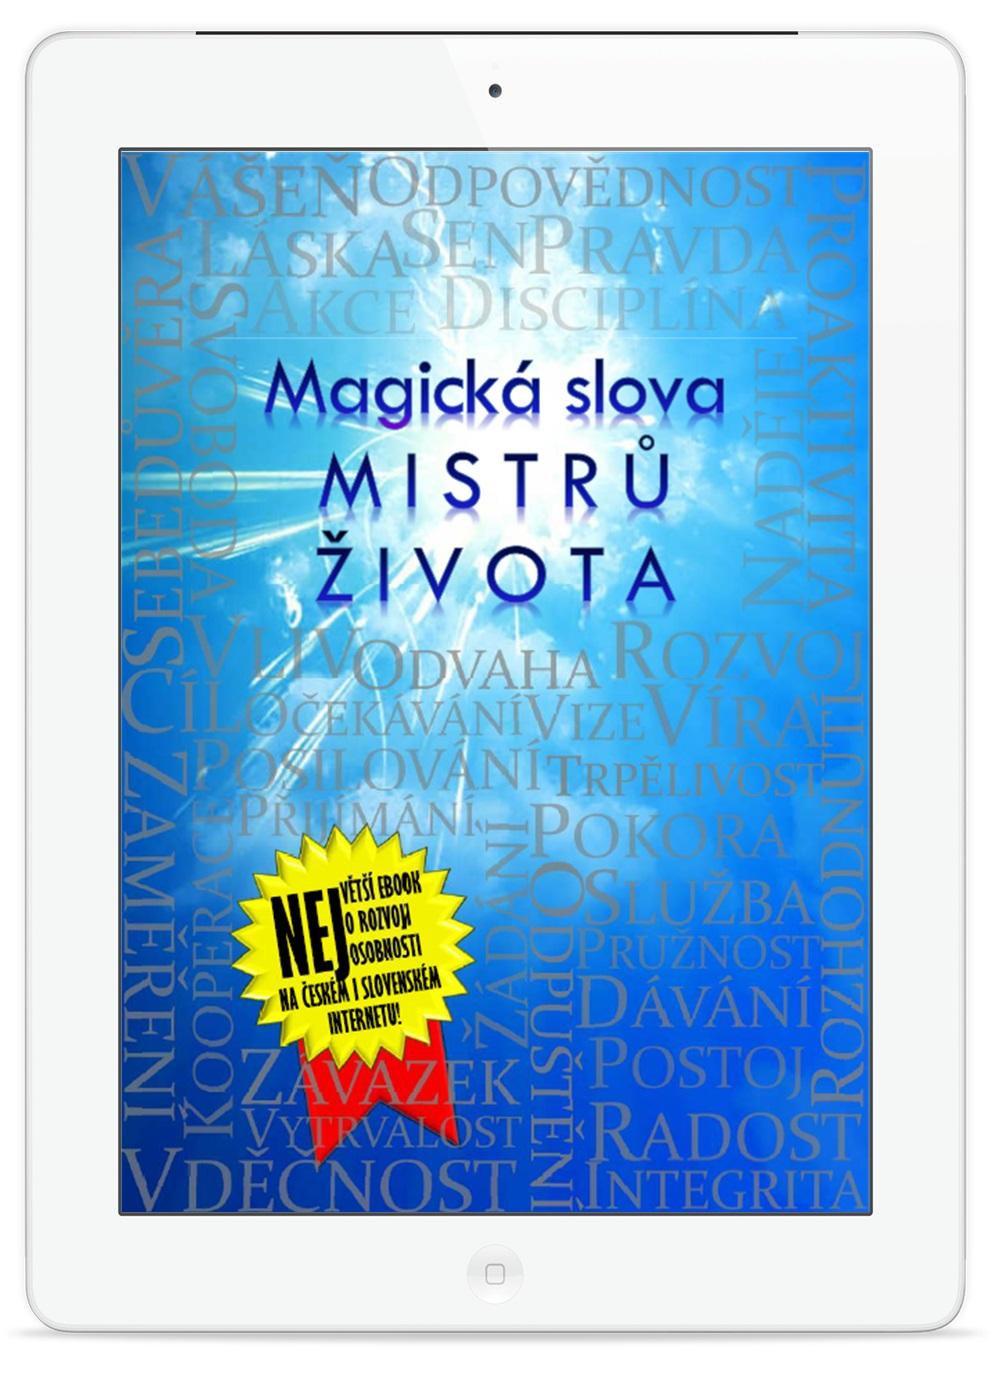 Magická Slova Mistrů Života, slova, magická slova, život, ebook